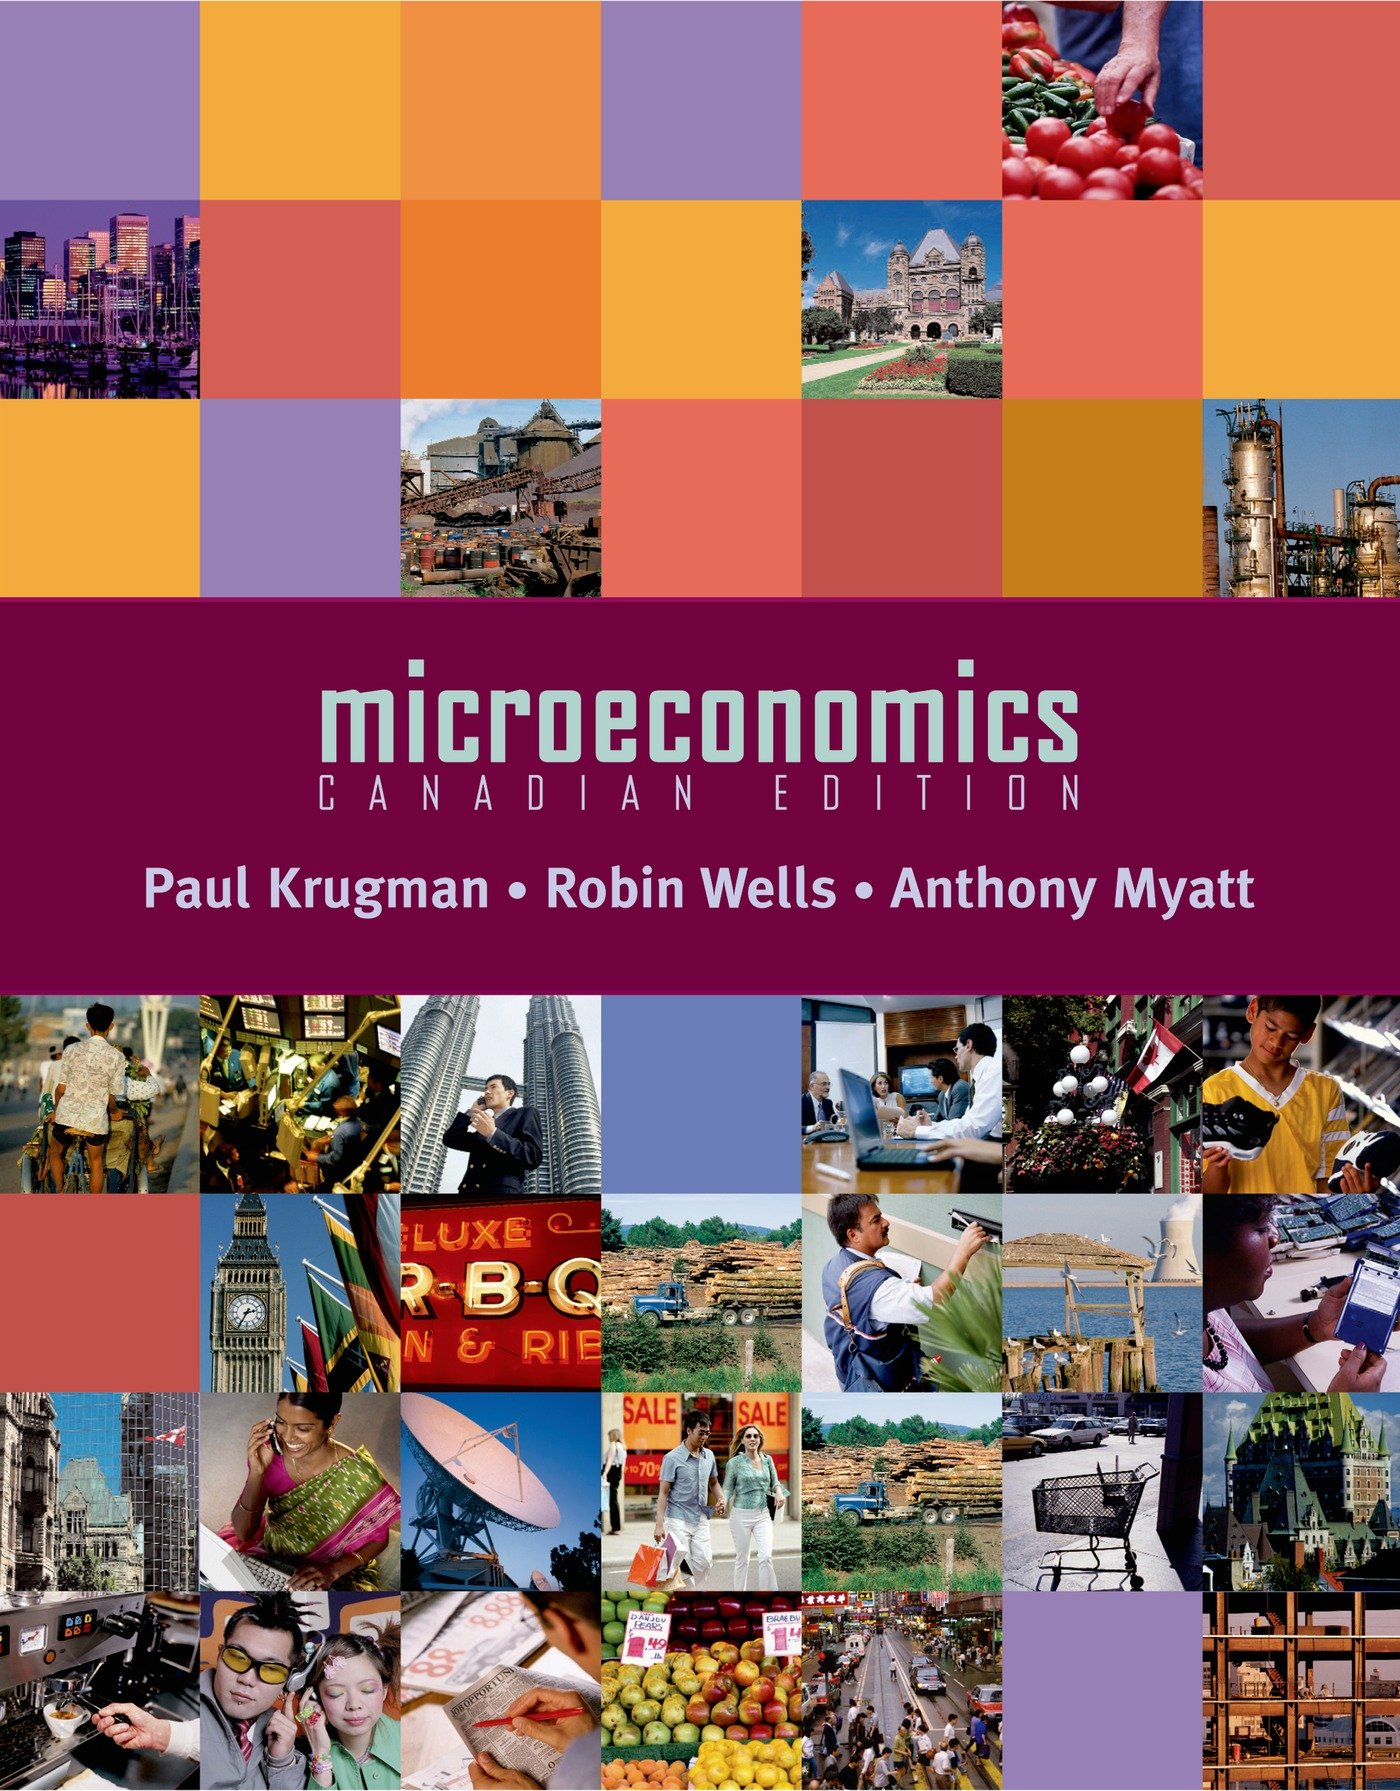 Microeconomics canadian edition paul krugman robin wells anthony microeconomics canadian edition paul krugman robin wells anthony myatt 9780716786894 books amazon fandeluxe Images